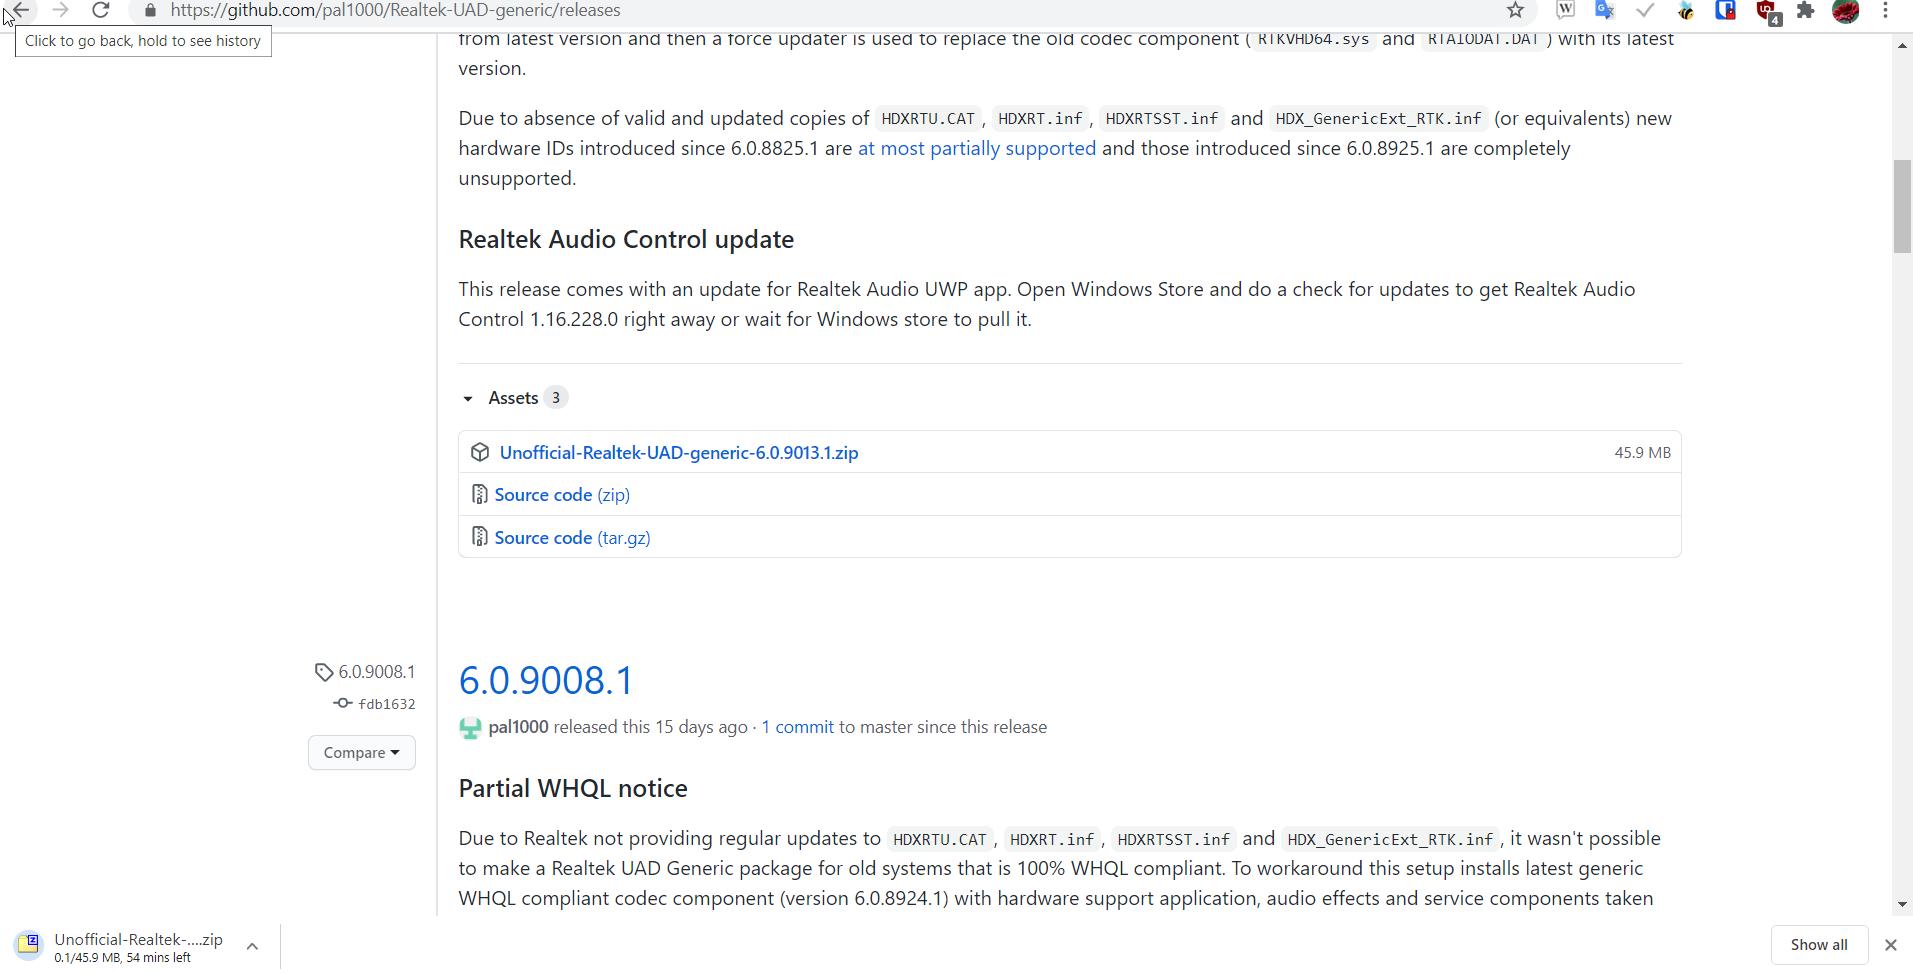 22.31.47-Releases · pal1000_Realtek-UAD-generic.png